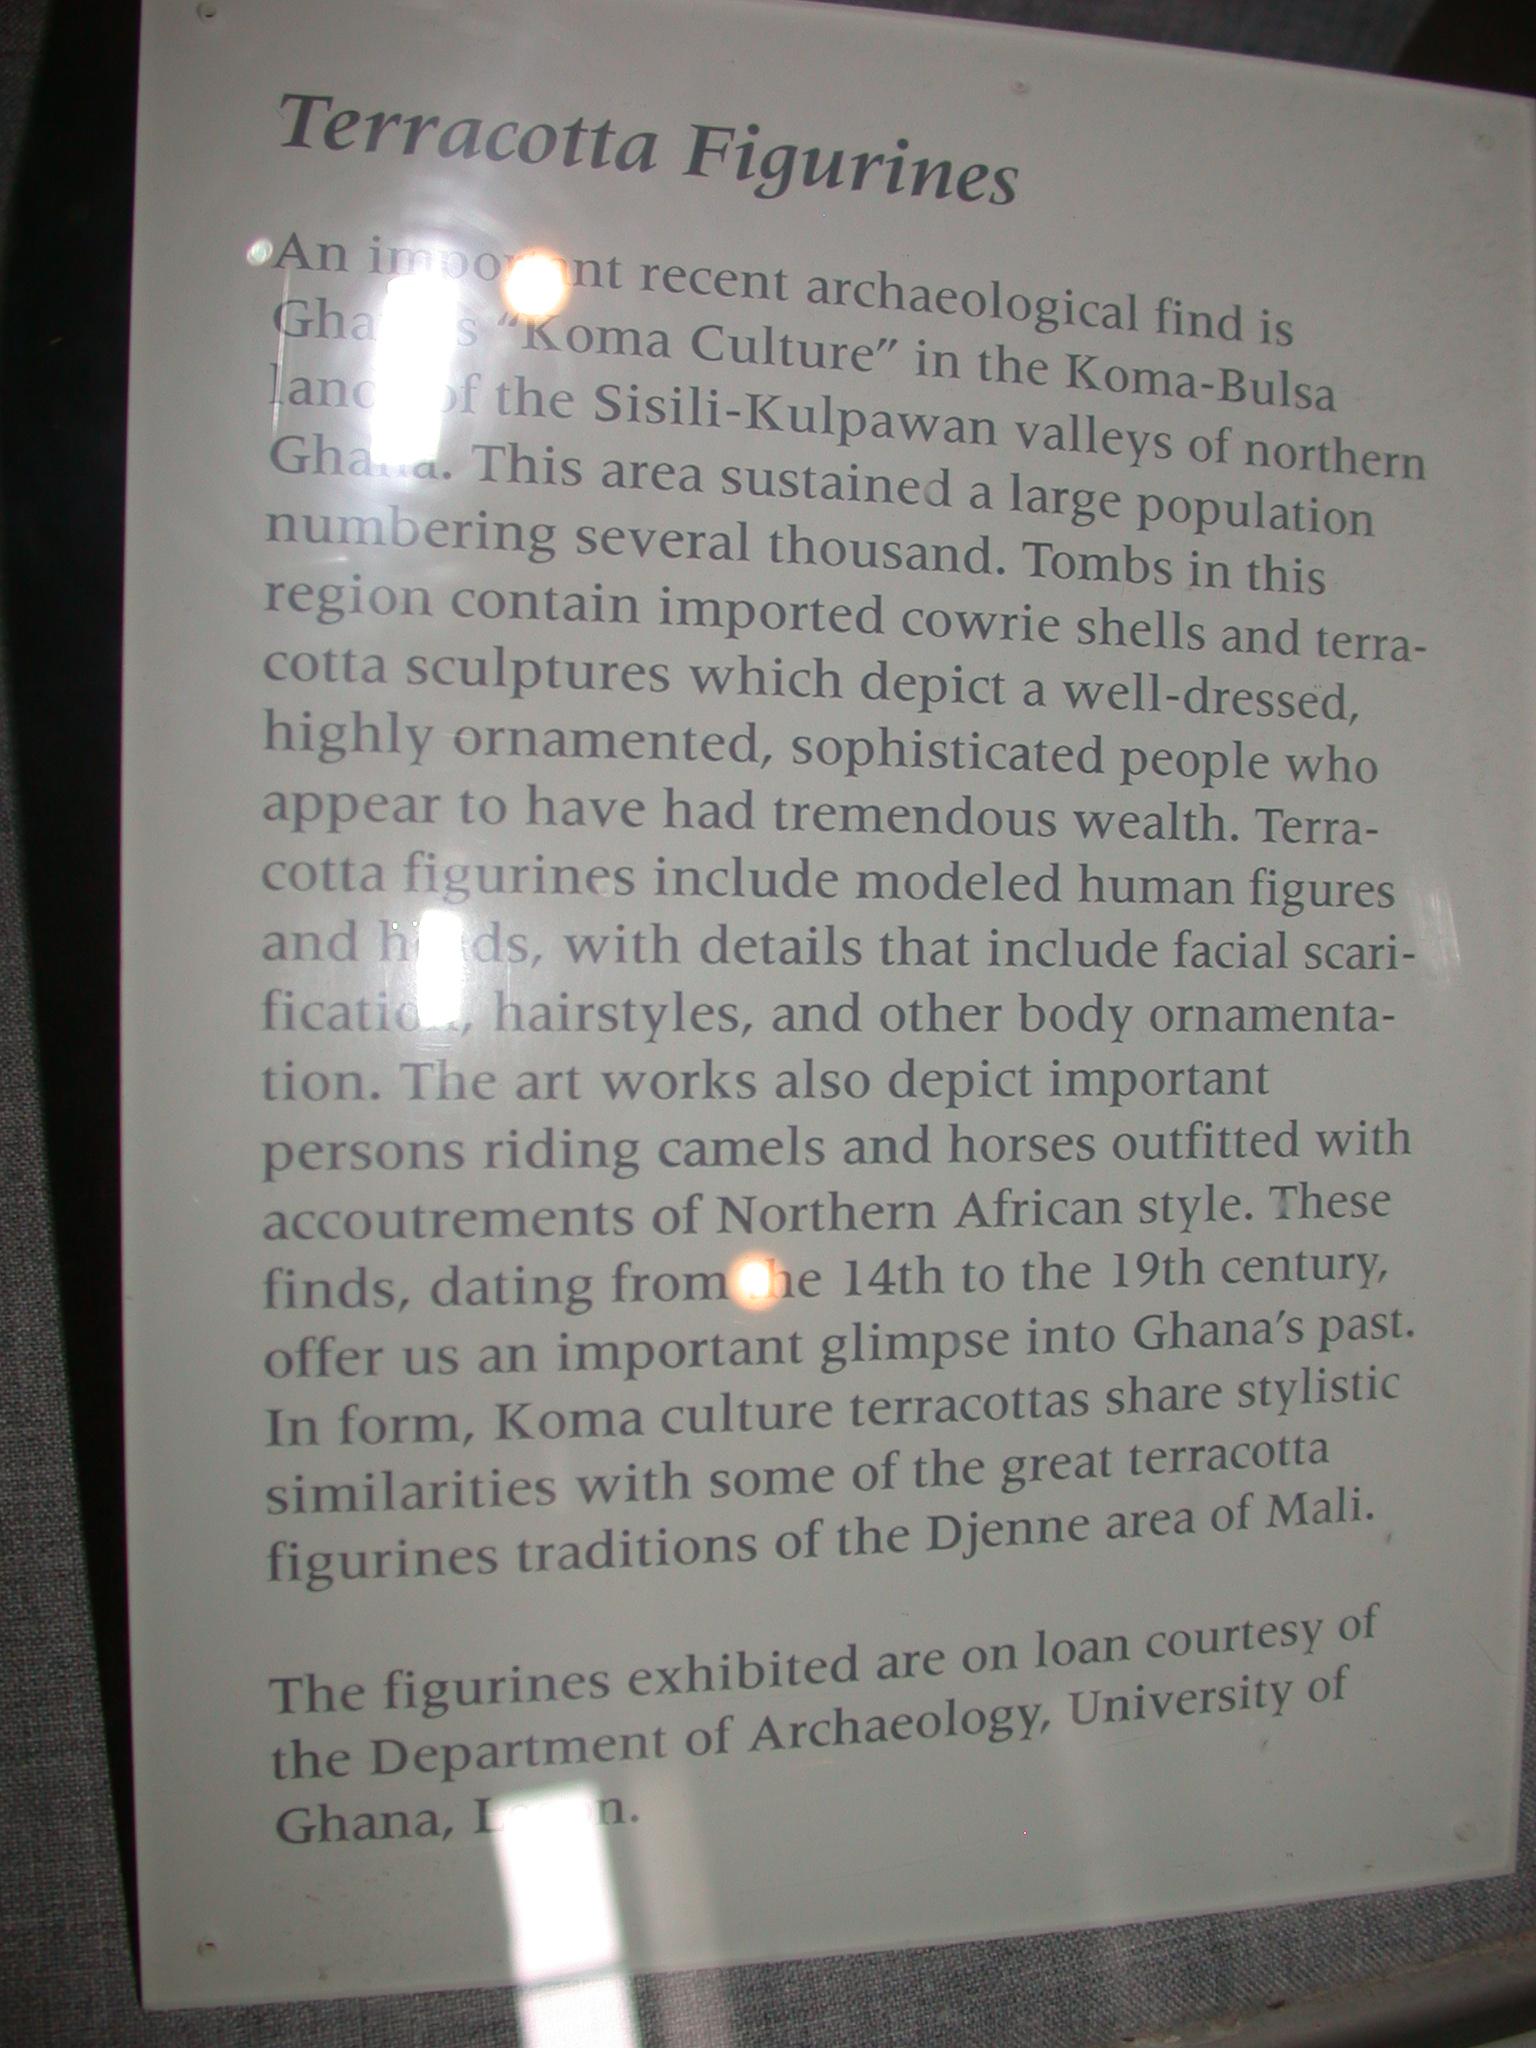 Komaland Koma-Bulsa Figurines Description, Cape Coast Slave Fort Museum, Cape Coast, Ghana